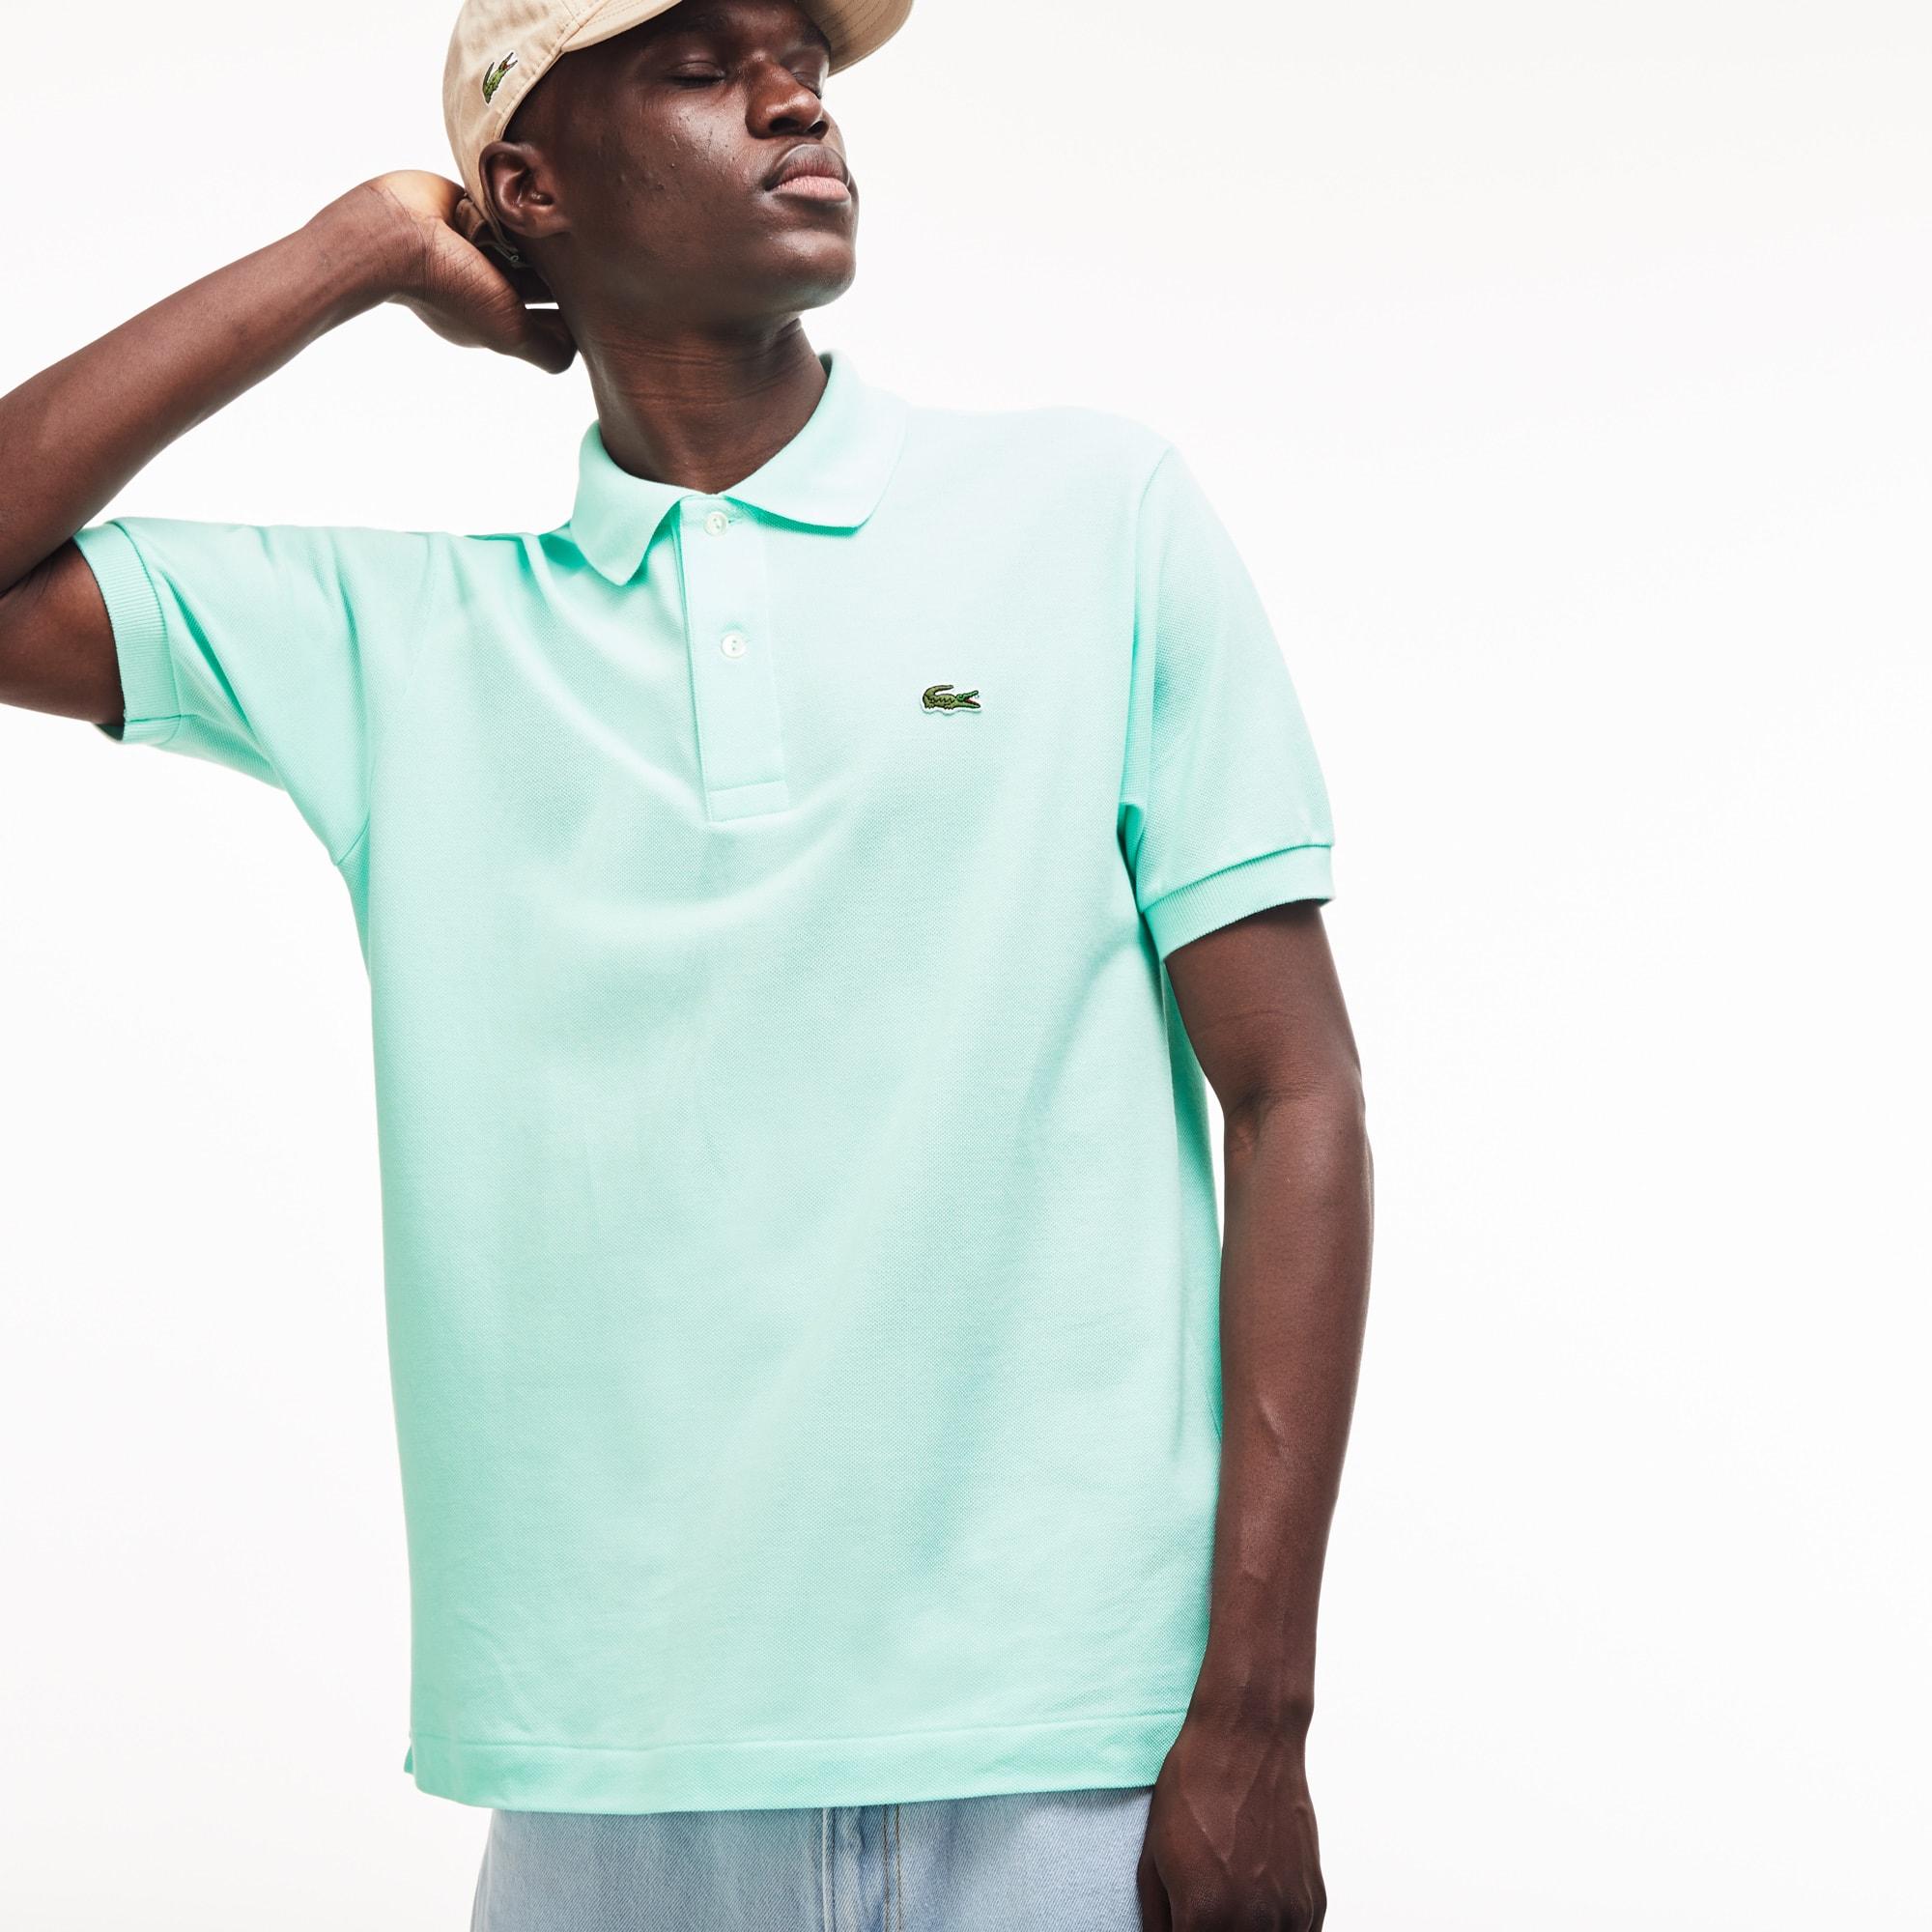 84f78d211 Men s Polo Shirts